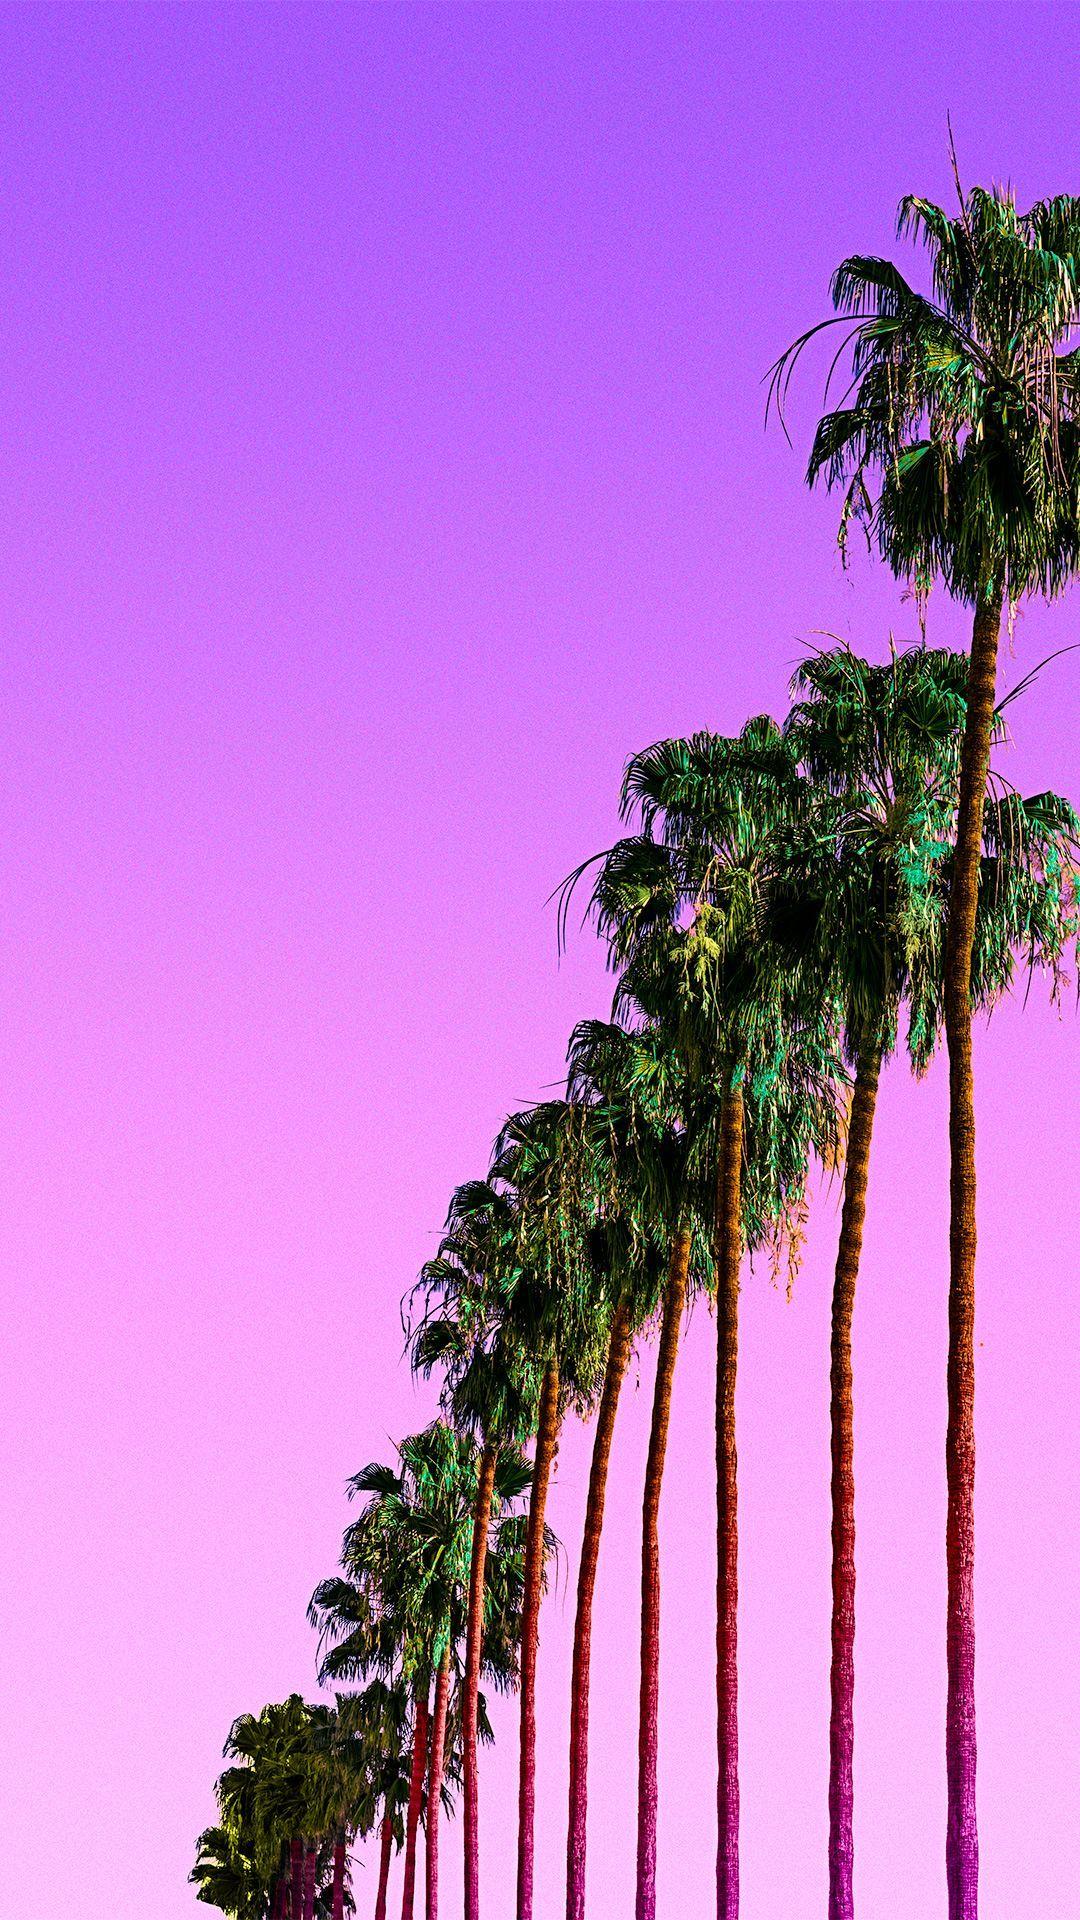 Https All Images Net Iphone Wallpaper Vaporwave Hd 4k 33 Iphone Wallpaper Vaporwave Hd 4k Wallpaper Iphone Summer Tree Wallpaper Purple Palm Trees Wallpaper